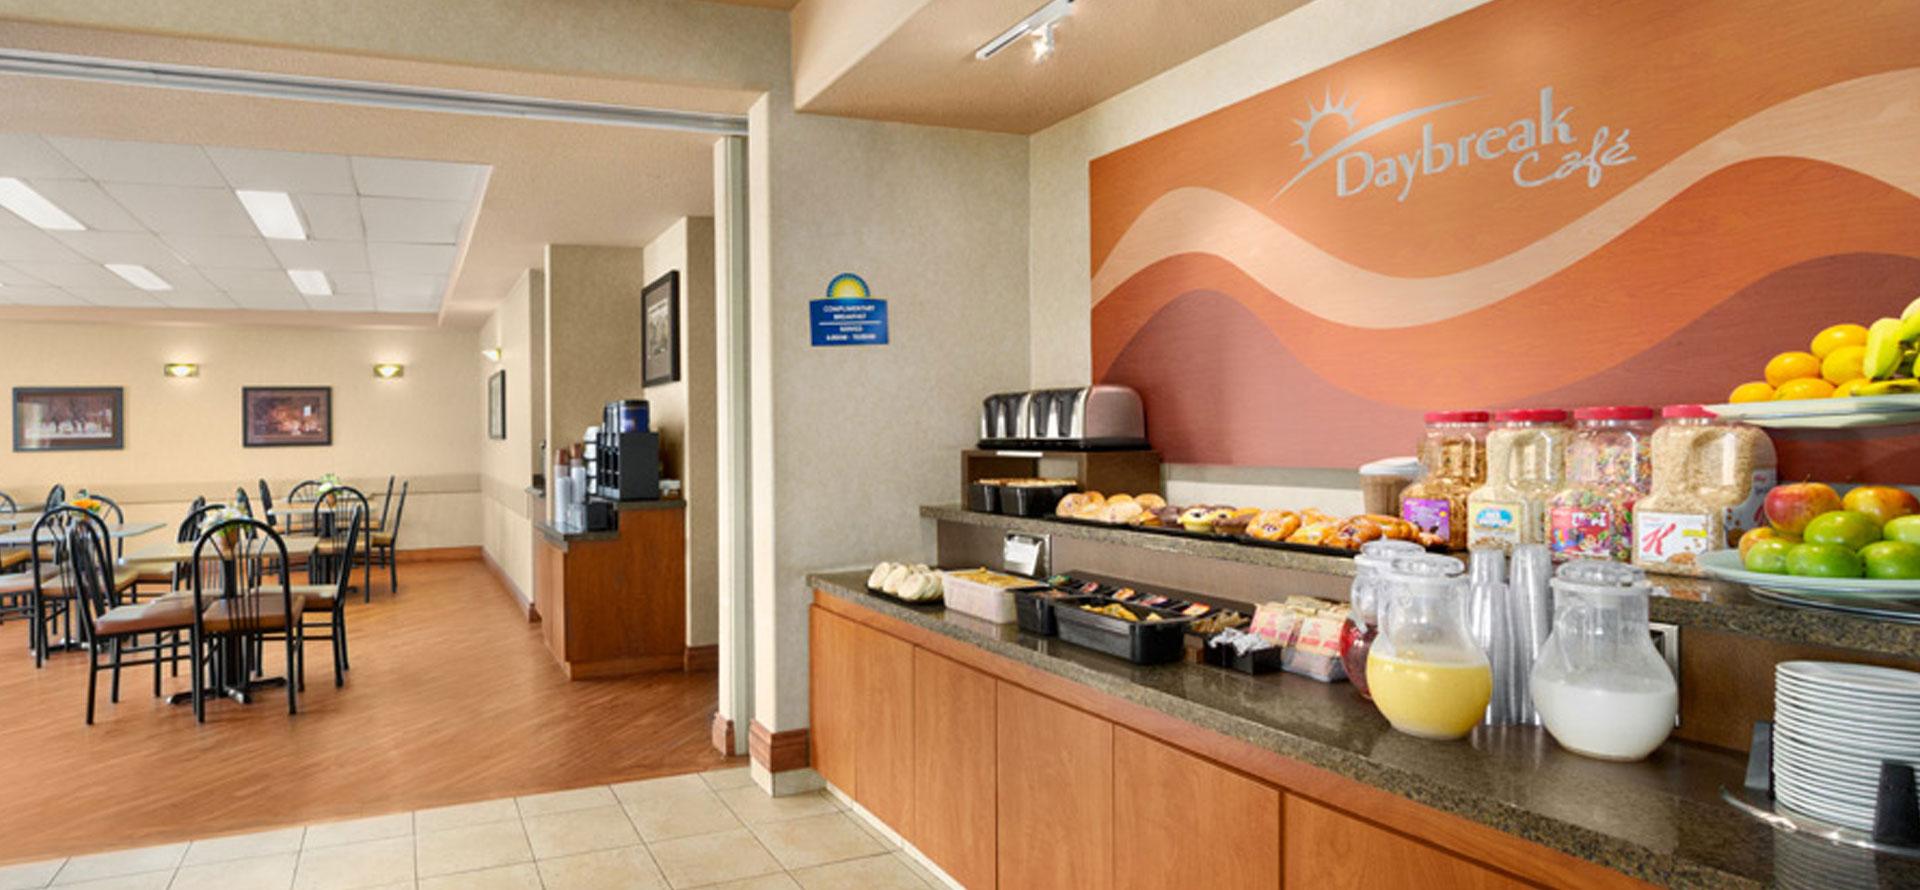 Large View Of The Breakfast Room At Days Inn Red Deer Alberta Overlooking Stocked